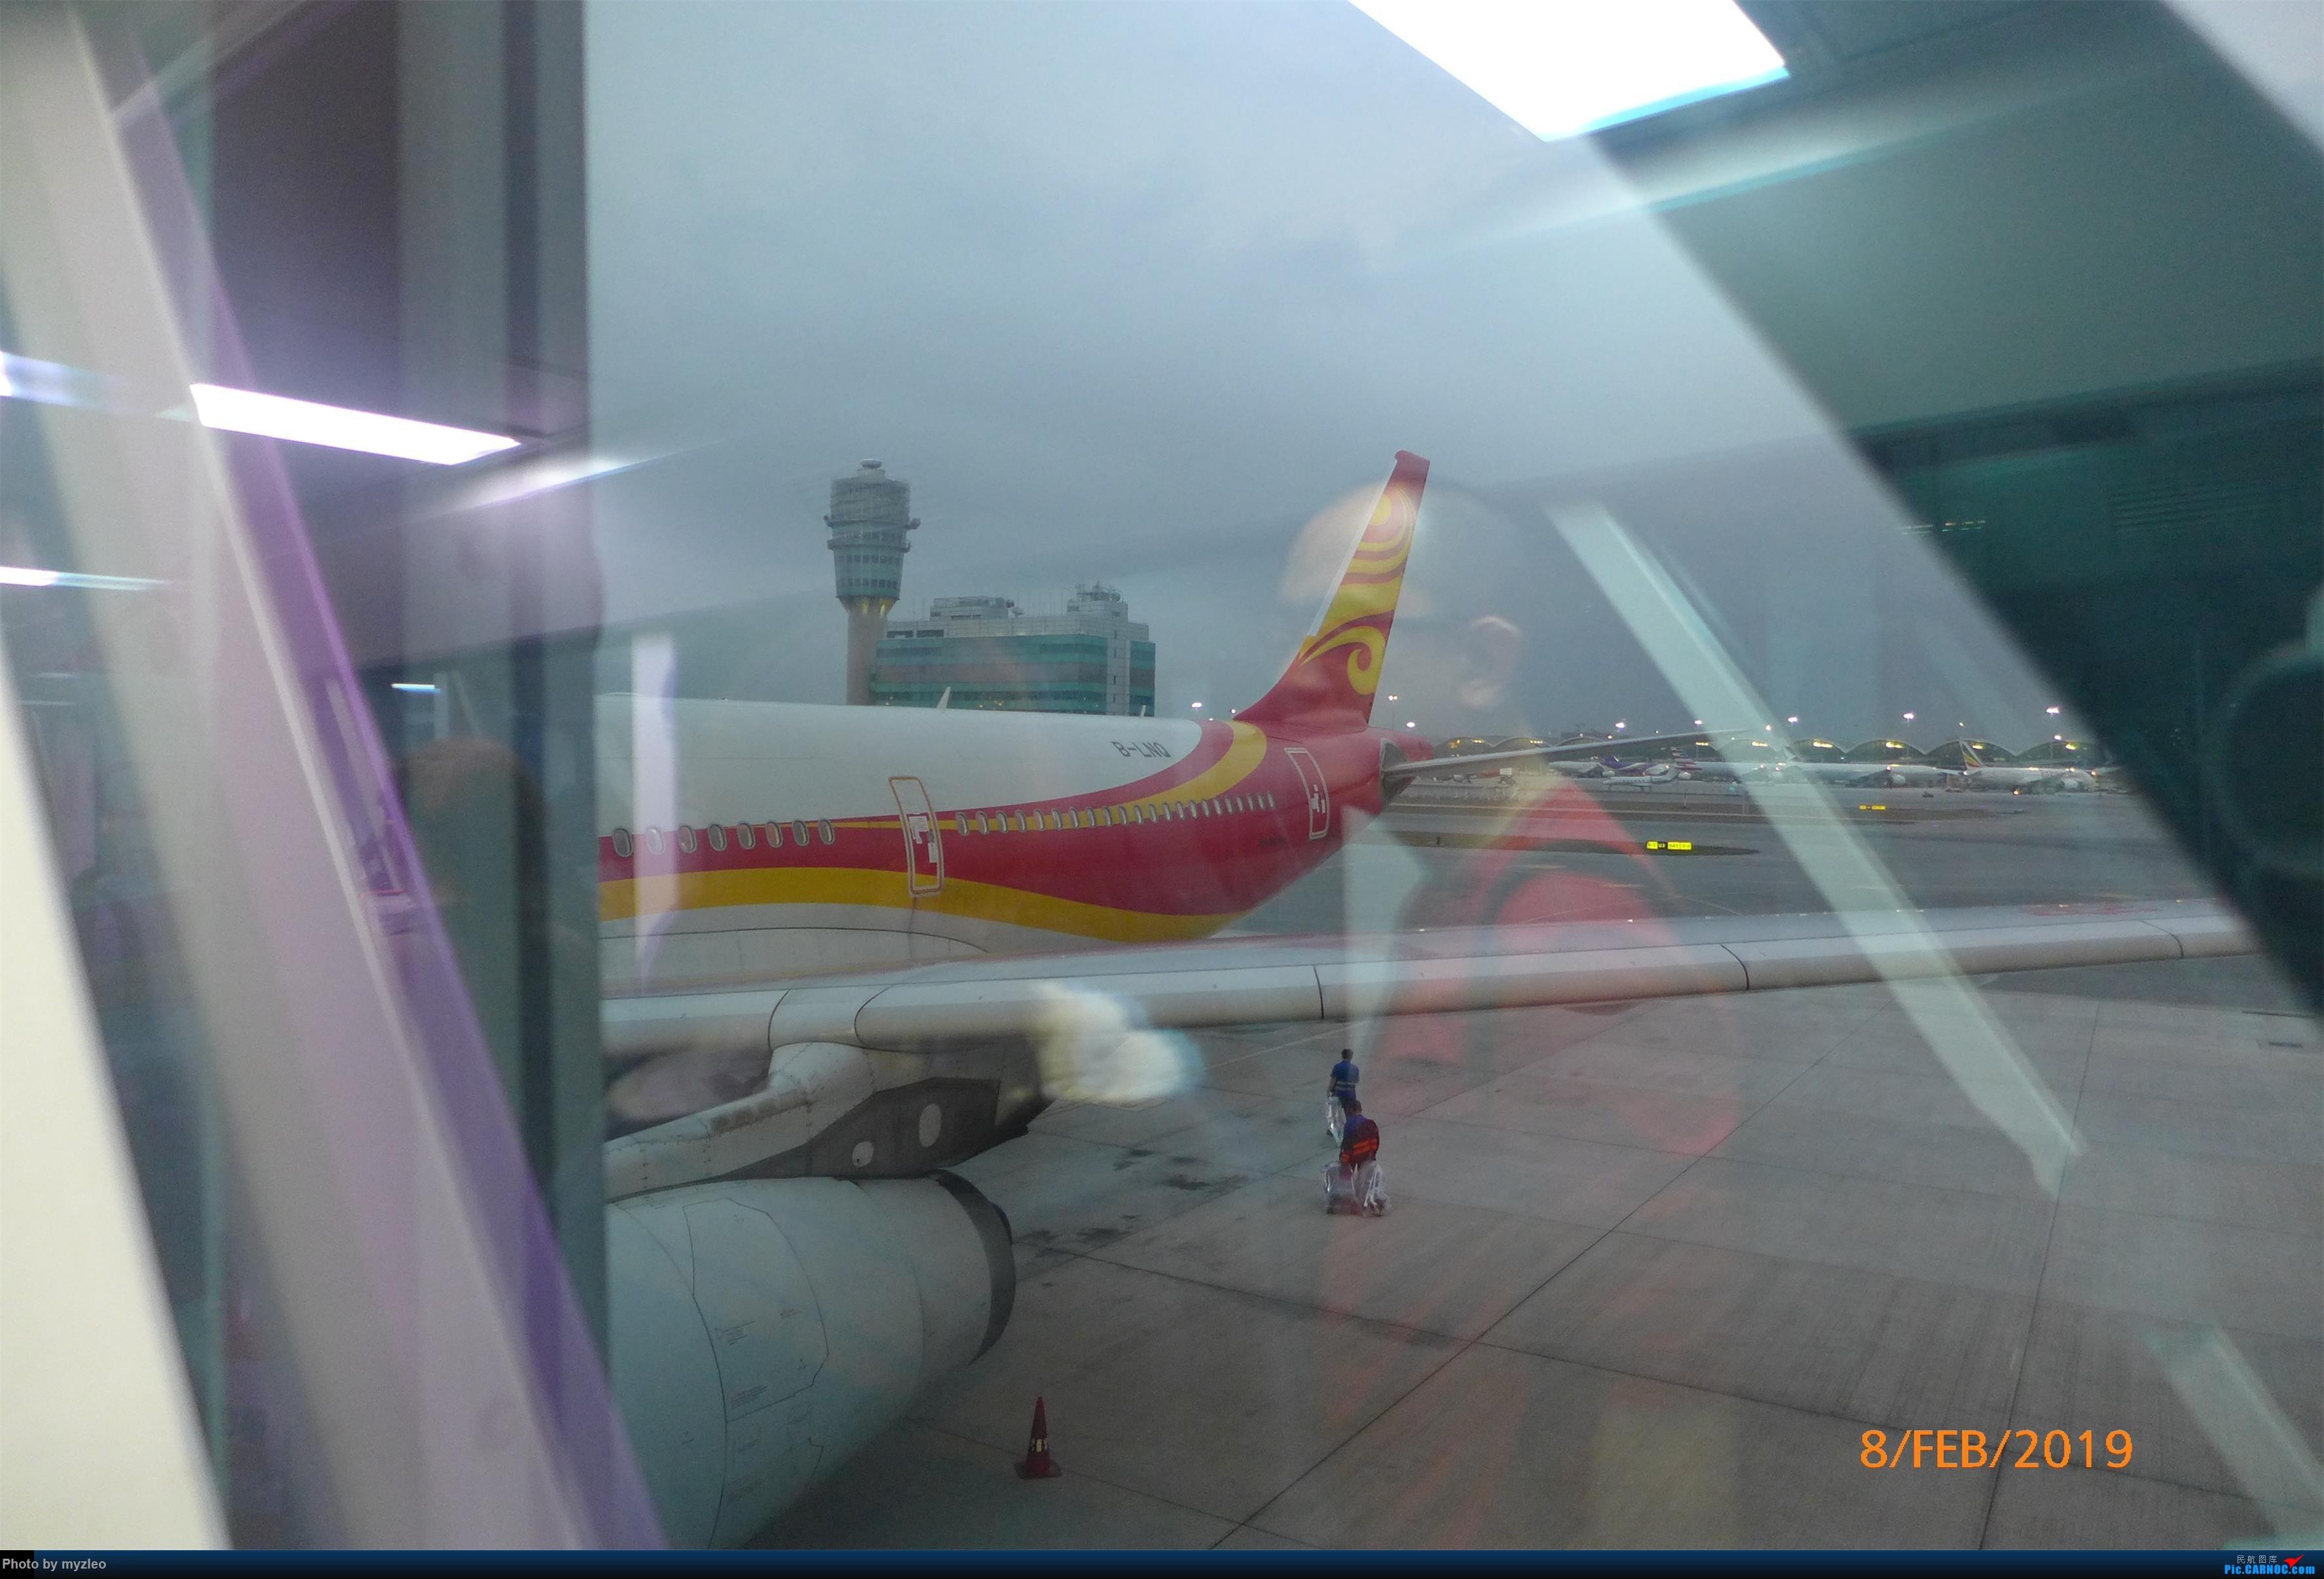 Re:[原创]【myzleo的游记4.5】十年之约(5)在香港的最后一天,搭乘港航333回沪 AIRBUS A330-300 B-LNQ 中国香港国际机场